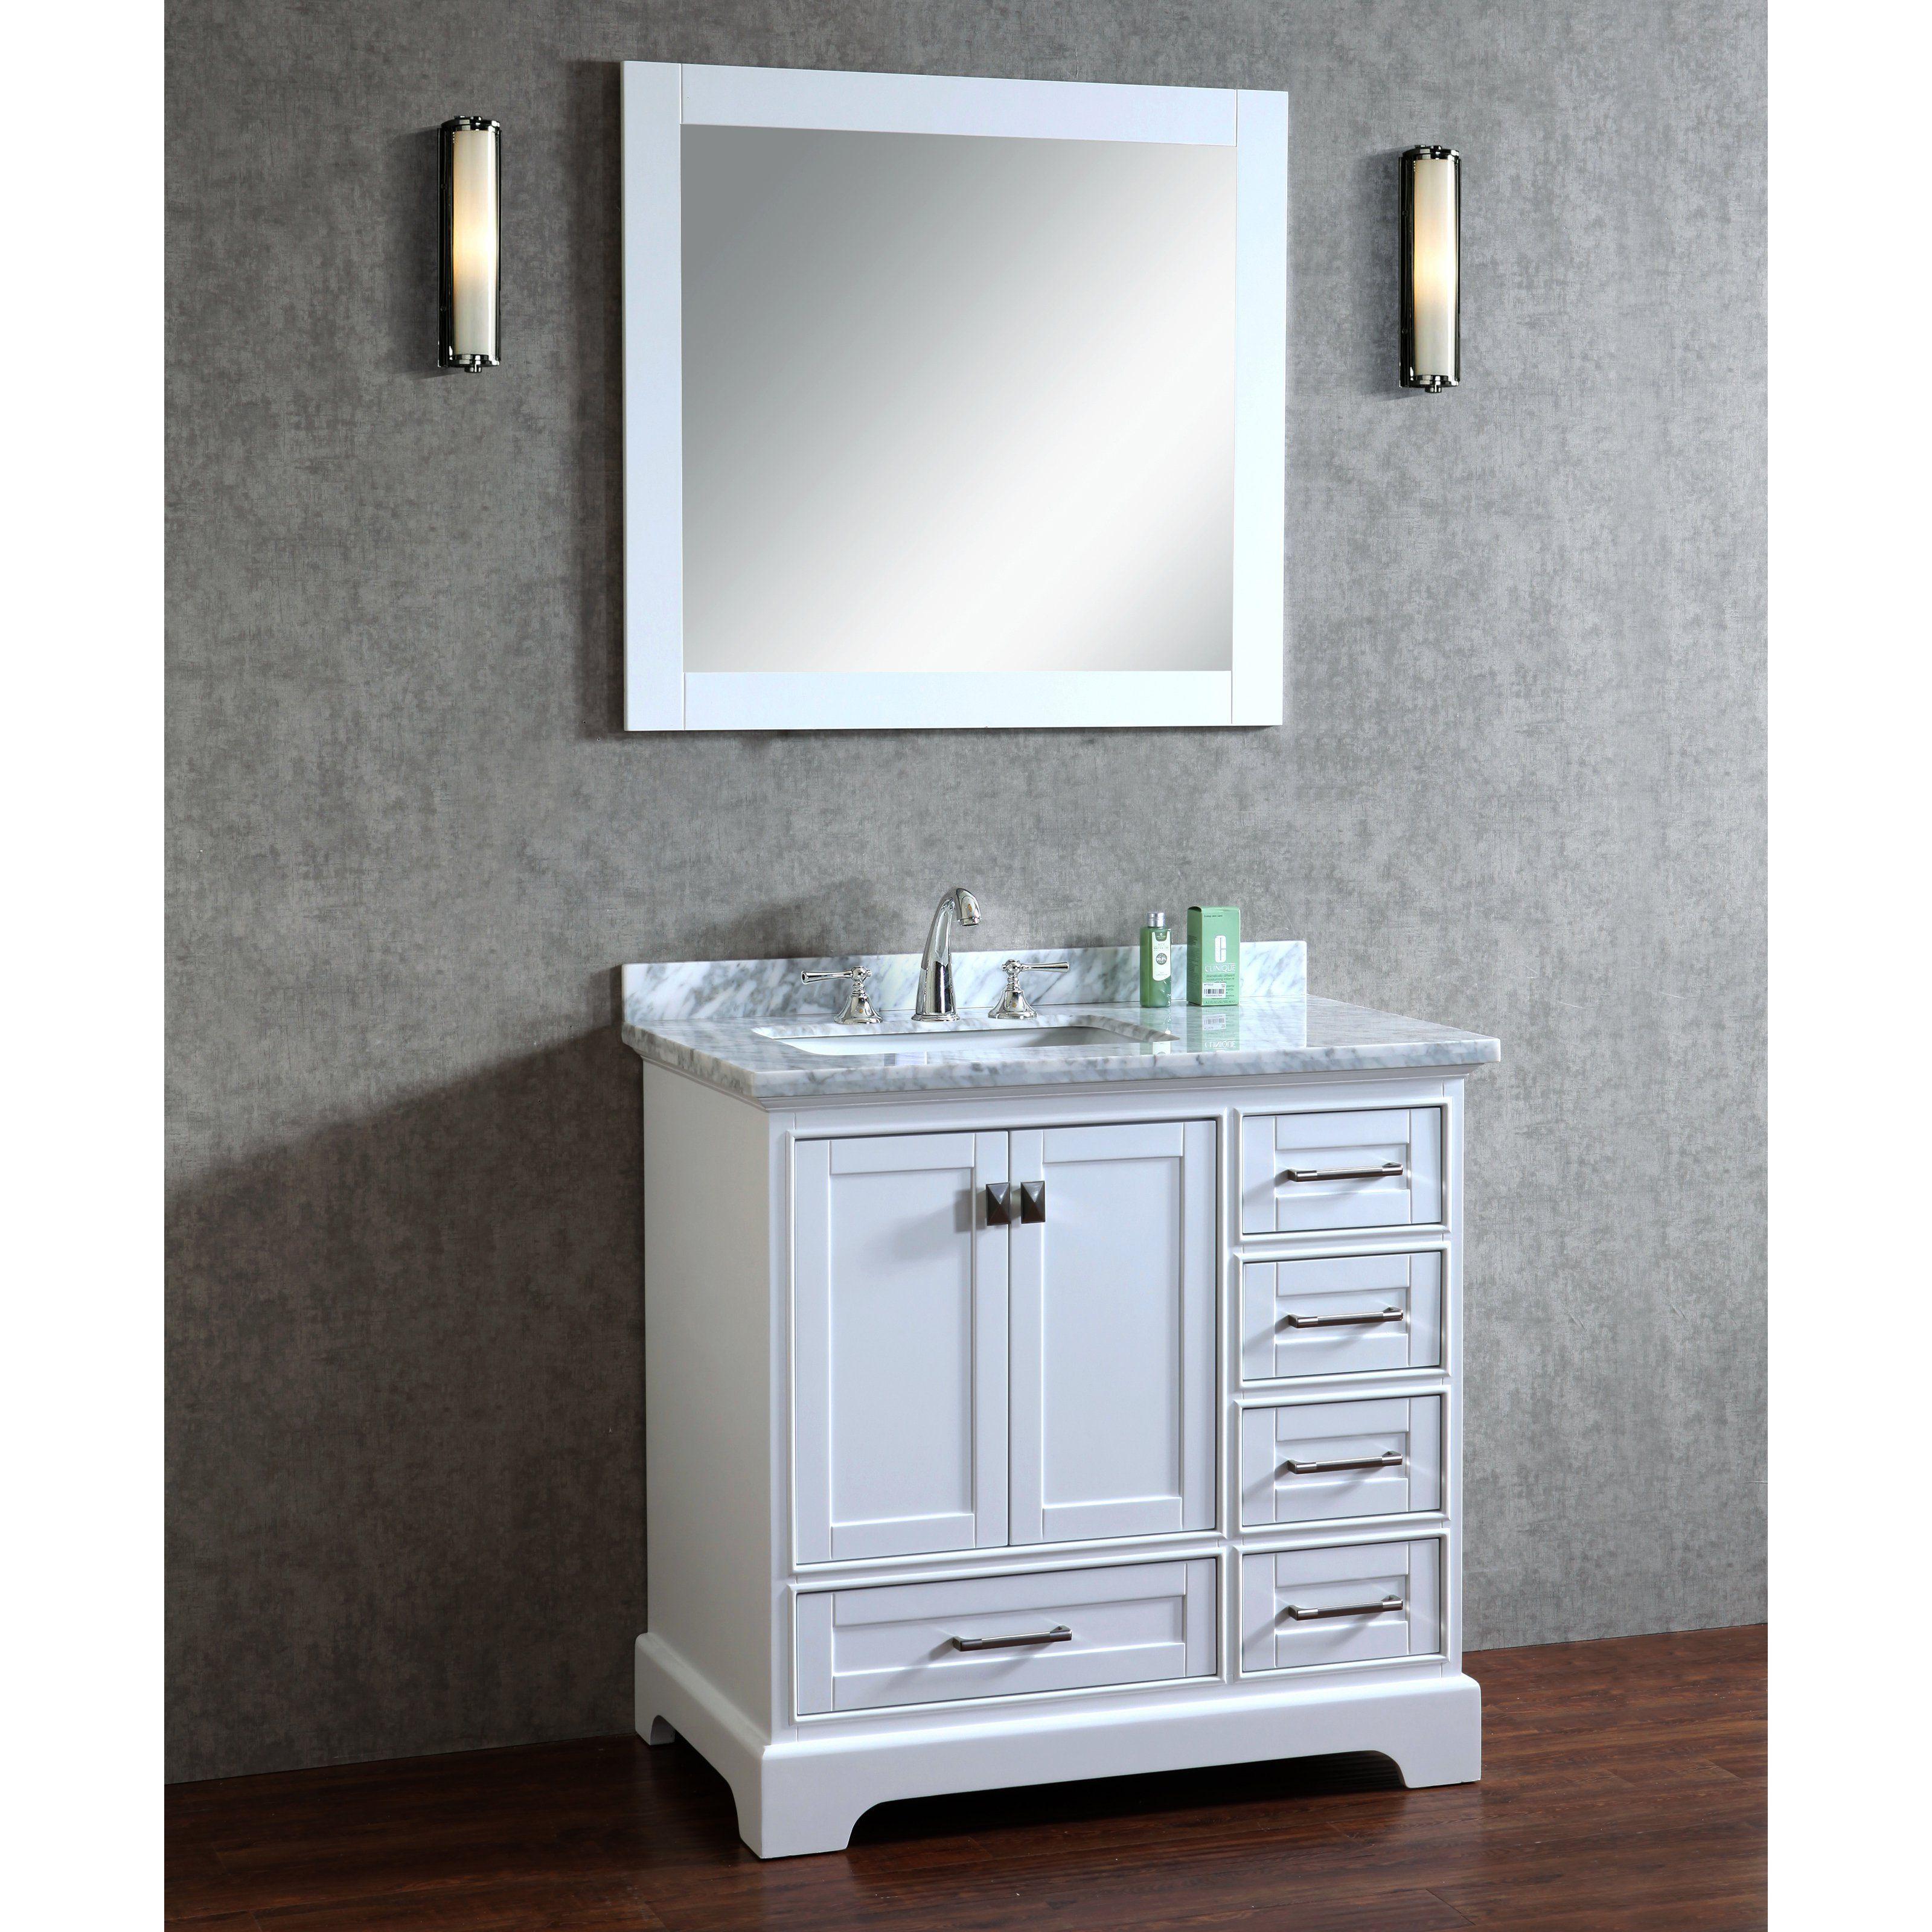 Bathroom interior hd stufurhome newport  in single sink bathroom vanity with mirror